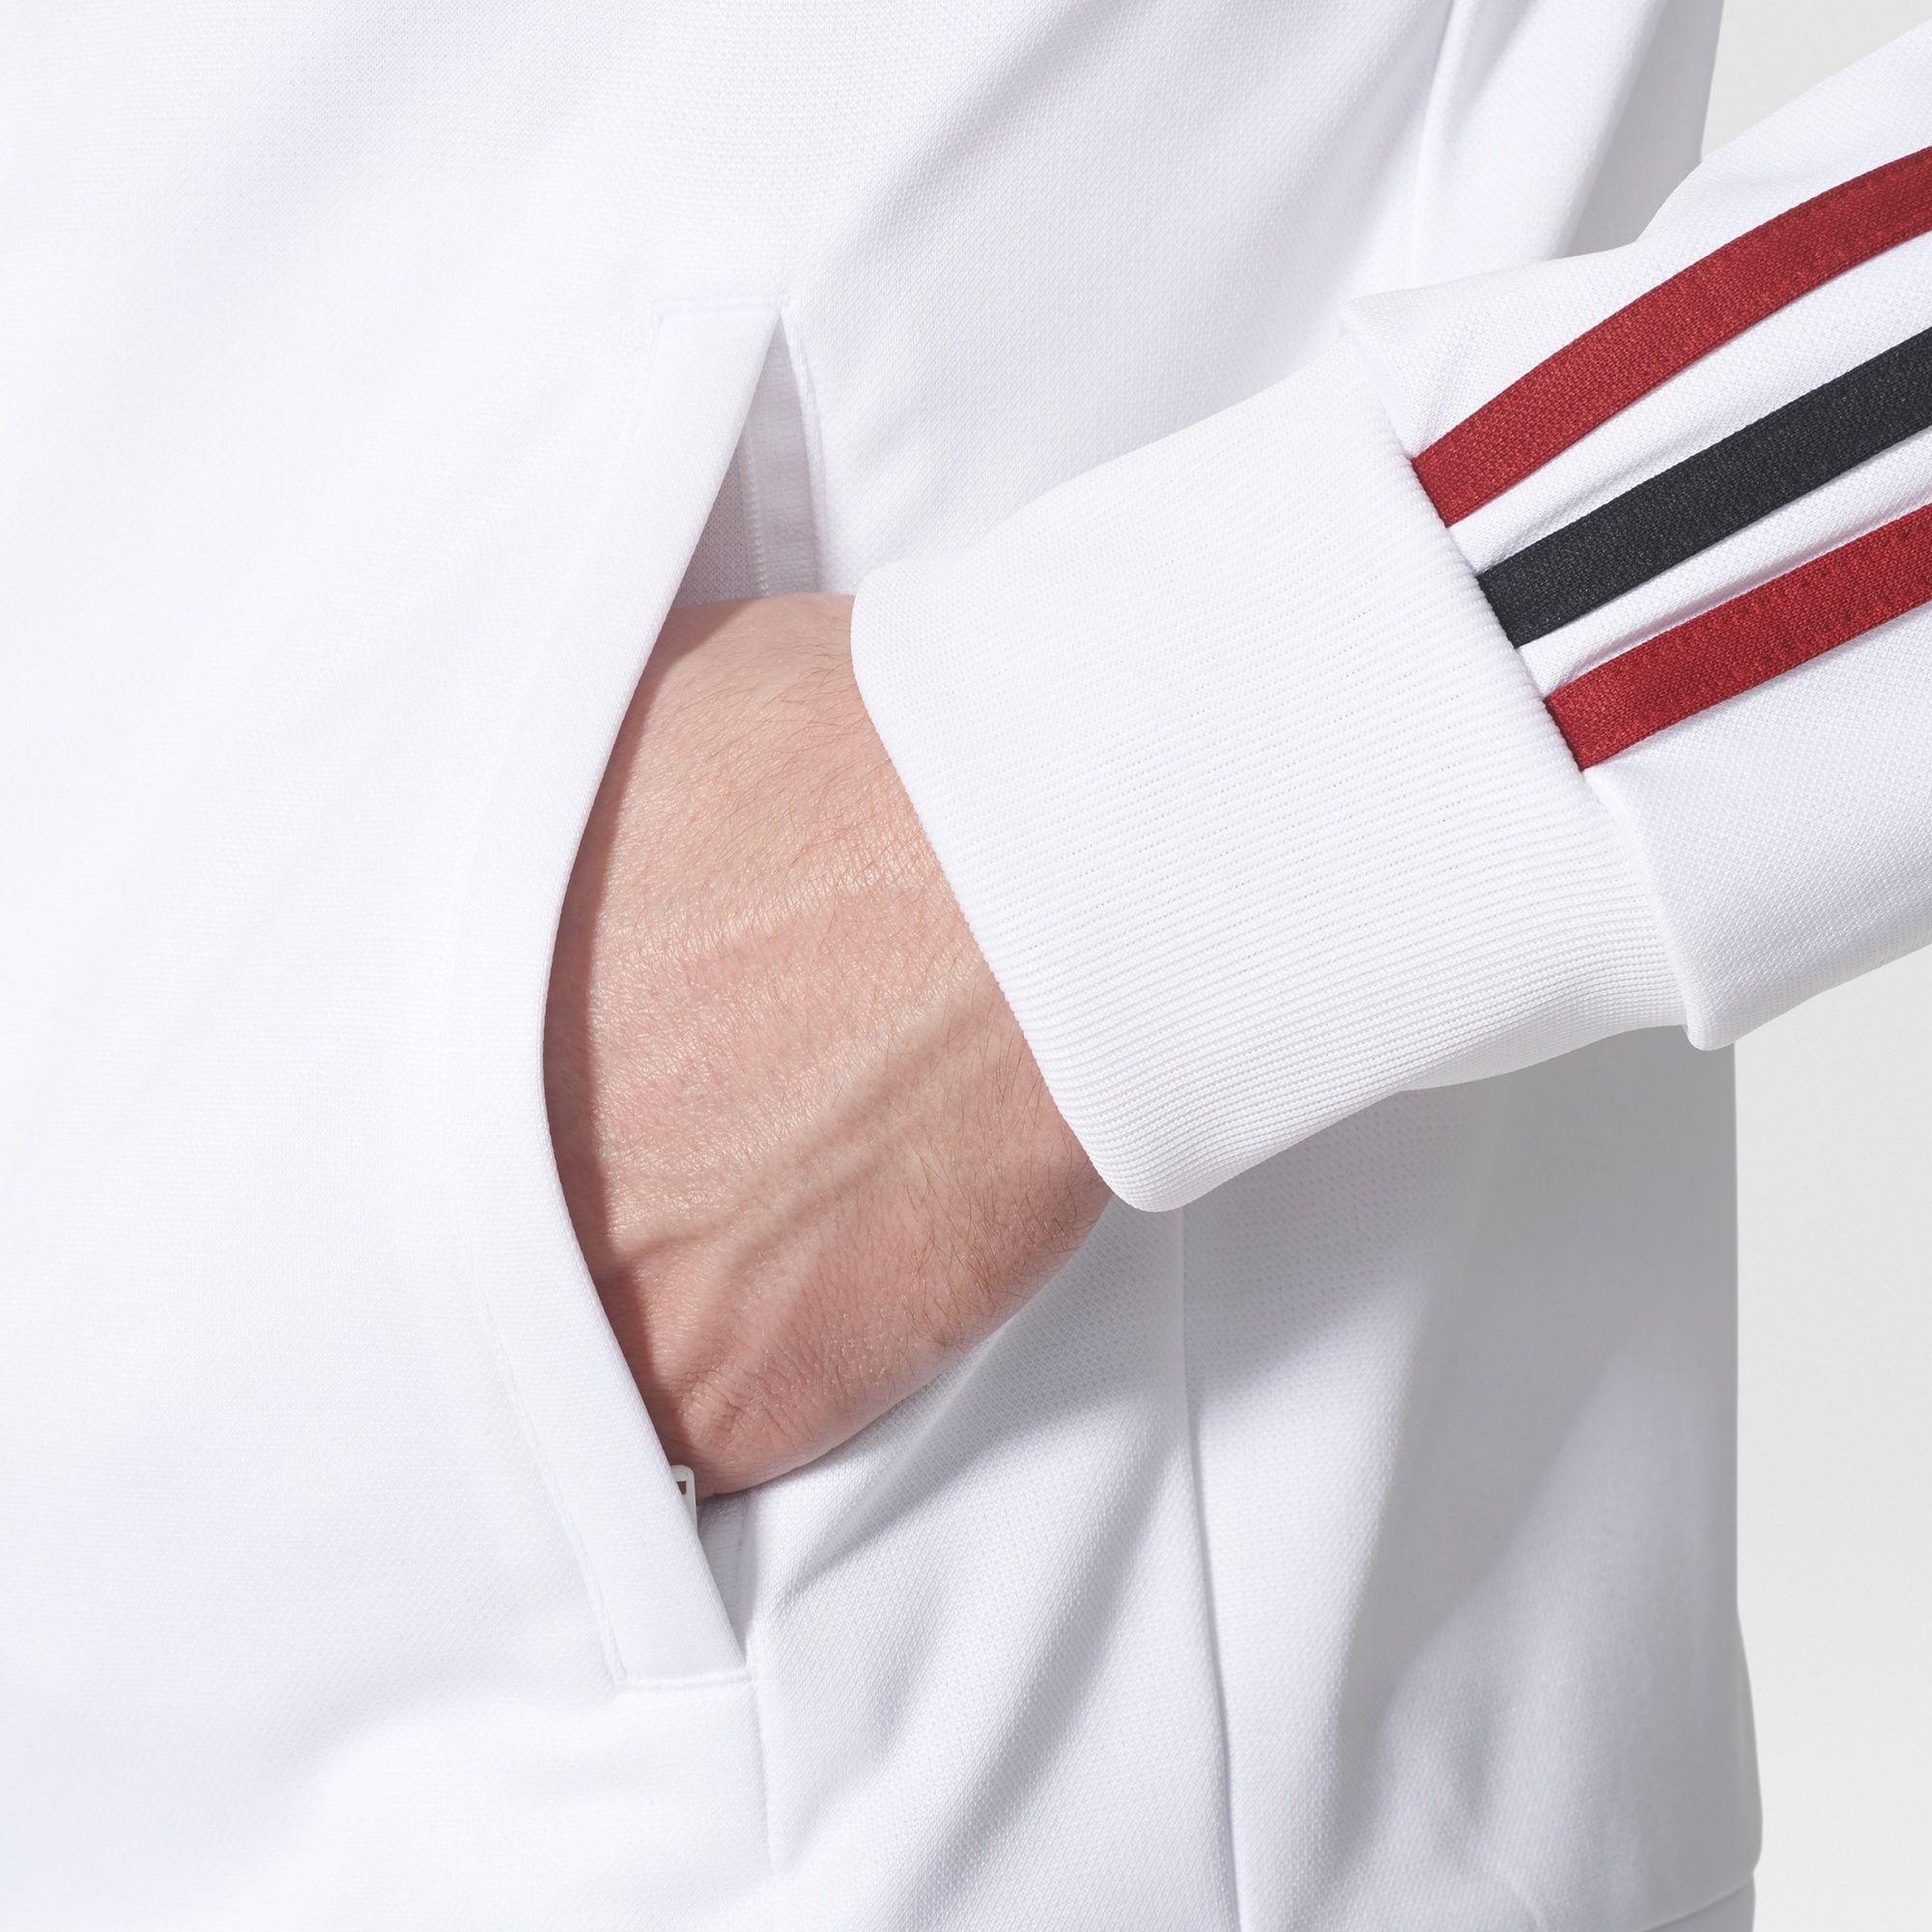 78260c3891 Adidas AC Milan 3-stripes Track Jacket - White / Black / Victory Red ...